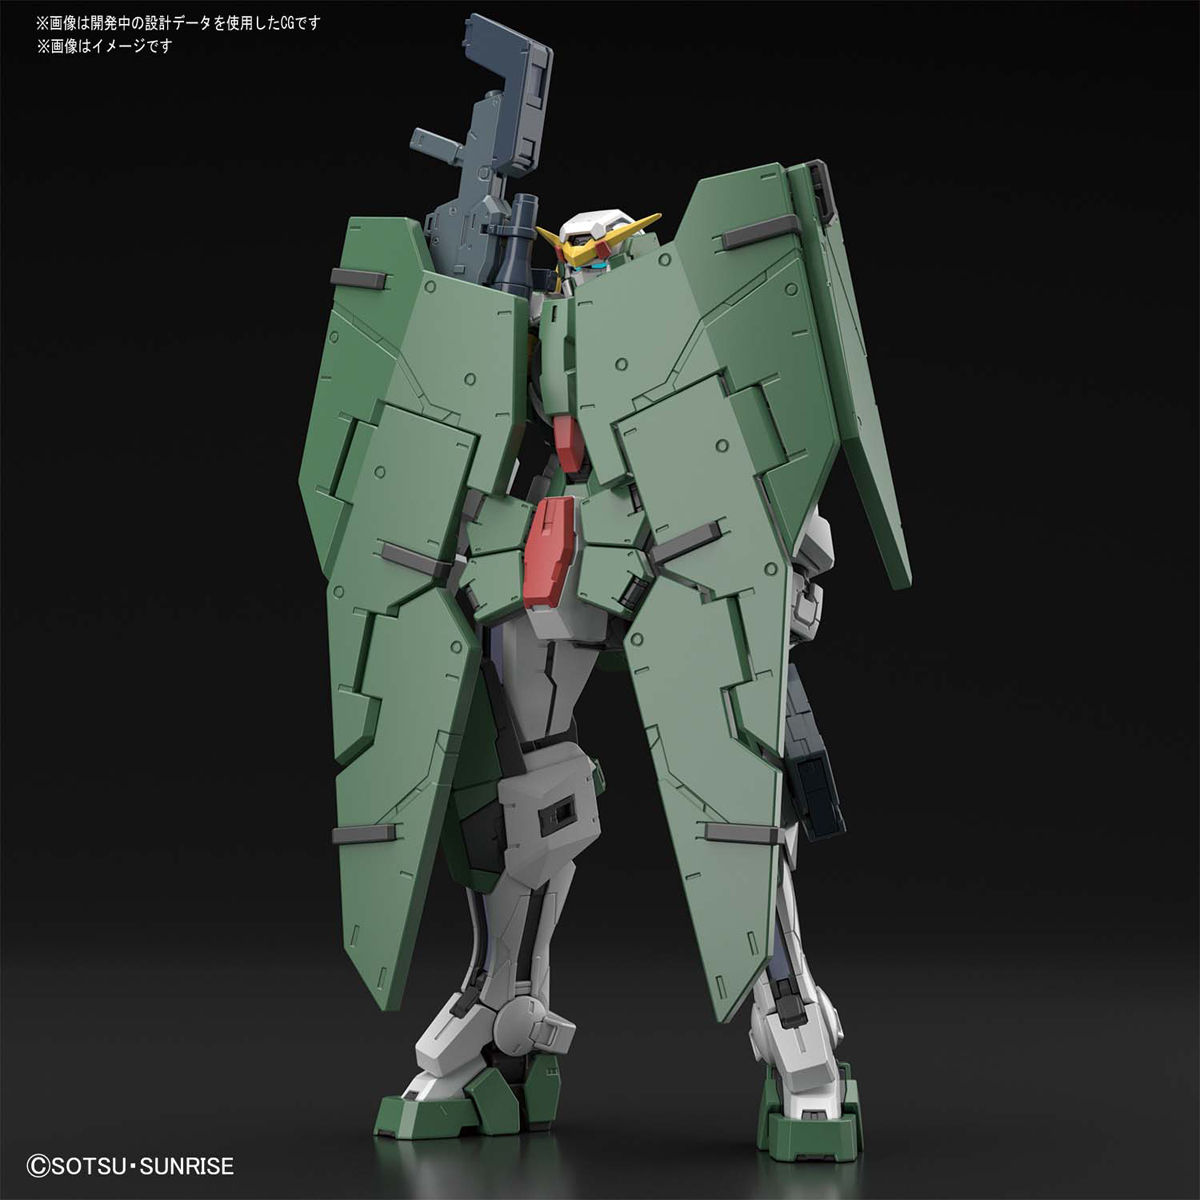 MG 『機動戦士ガンダム00』 1/100 ガンダムデュナメス プラモデル